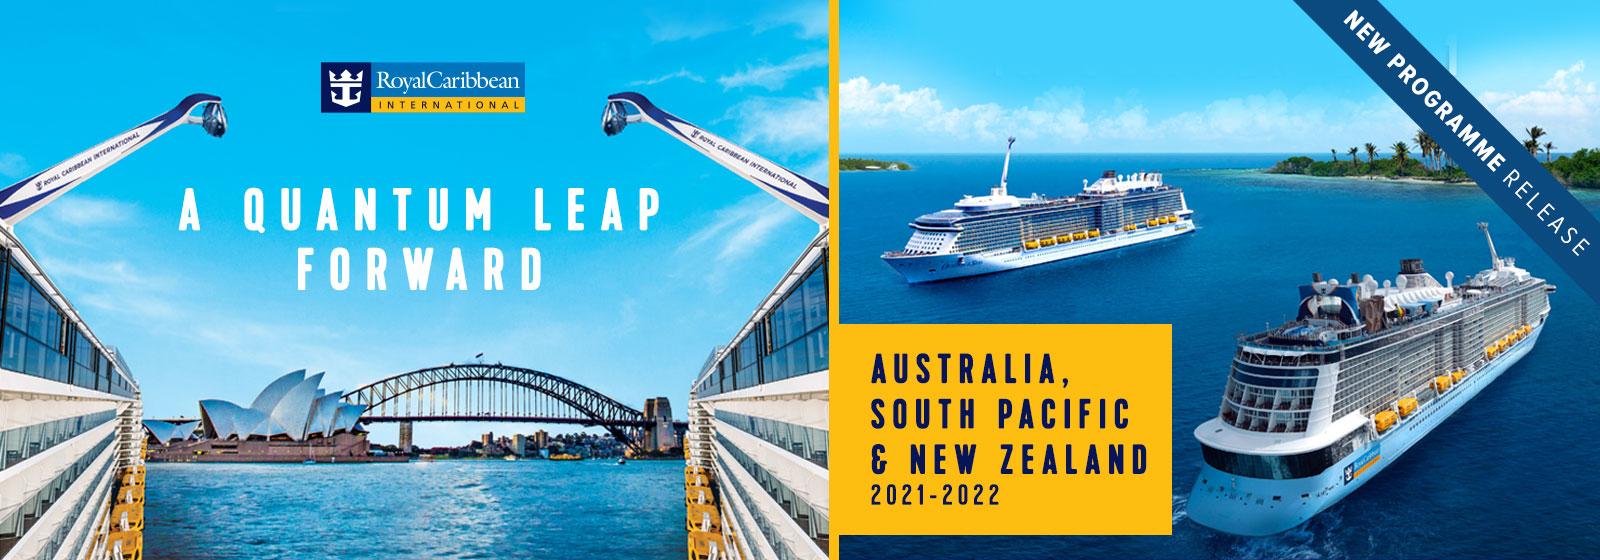 Royal Caribbean - Australia, NZ & South Pacific 21/22-2